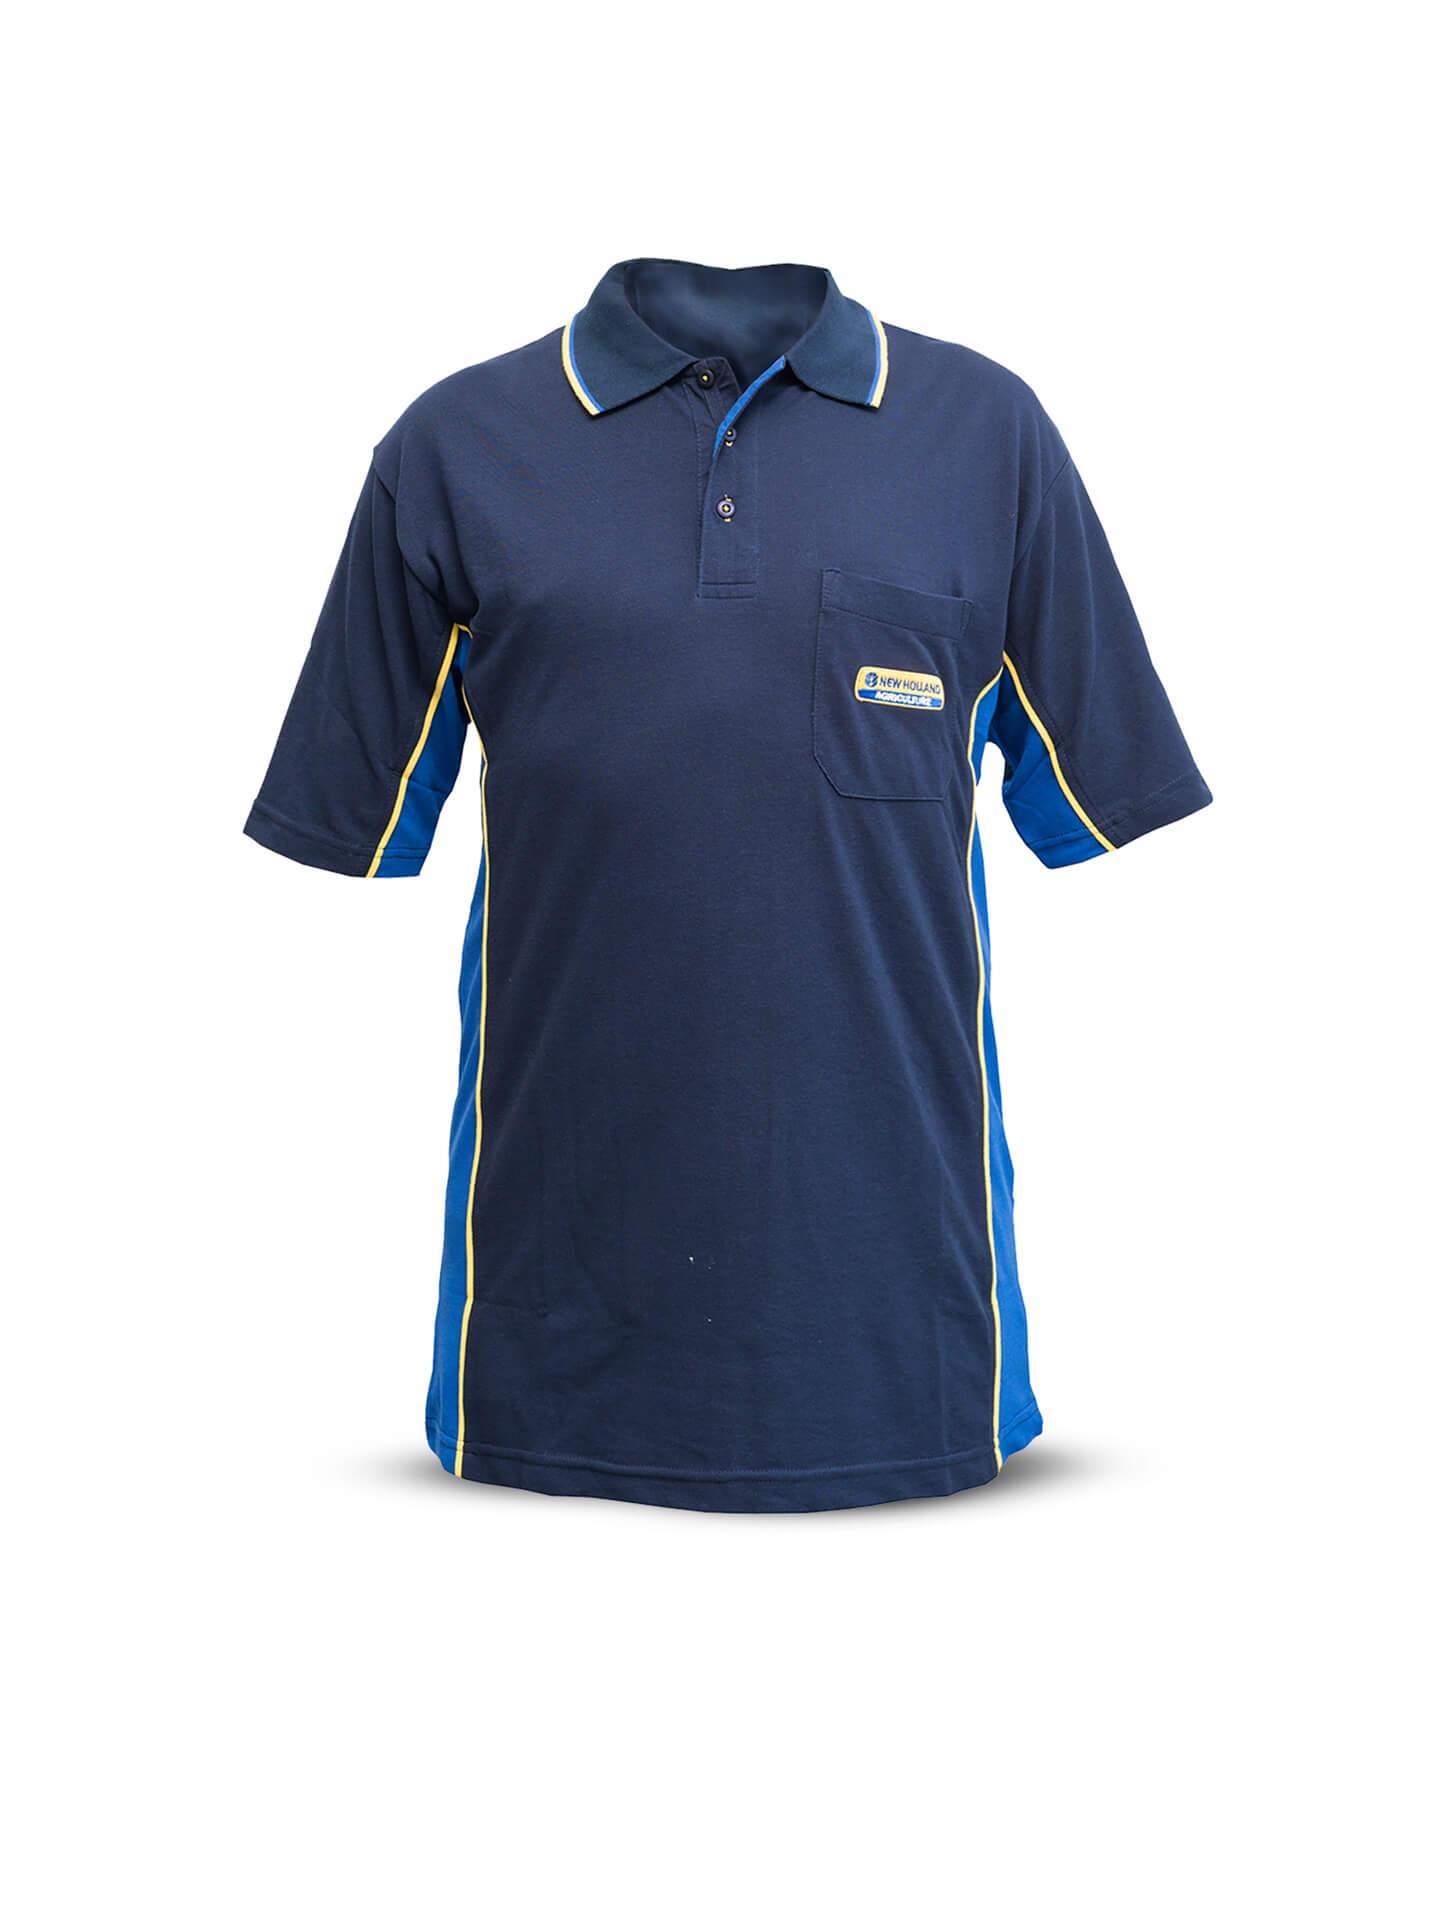 0002669 mans polo shirt breast pocket